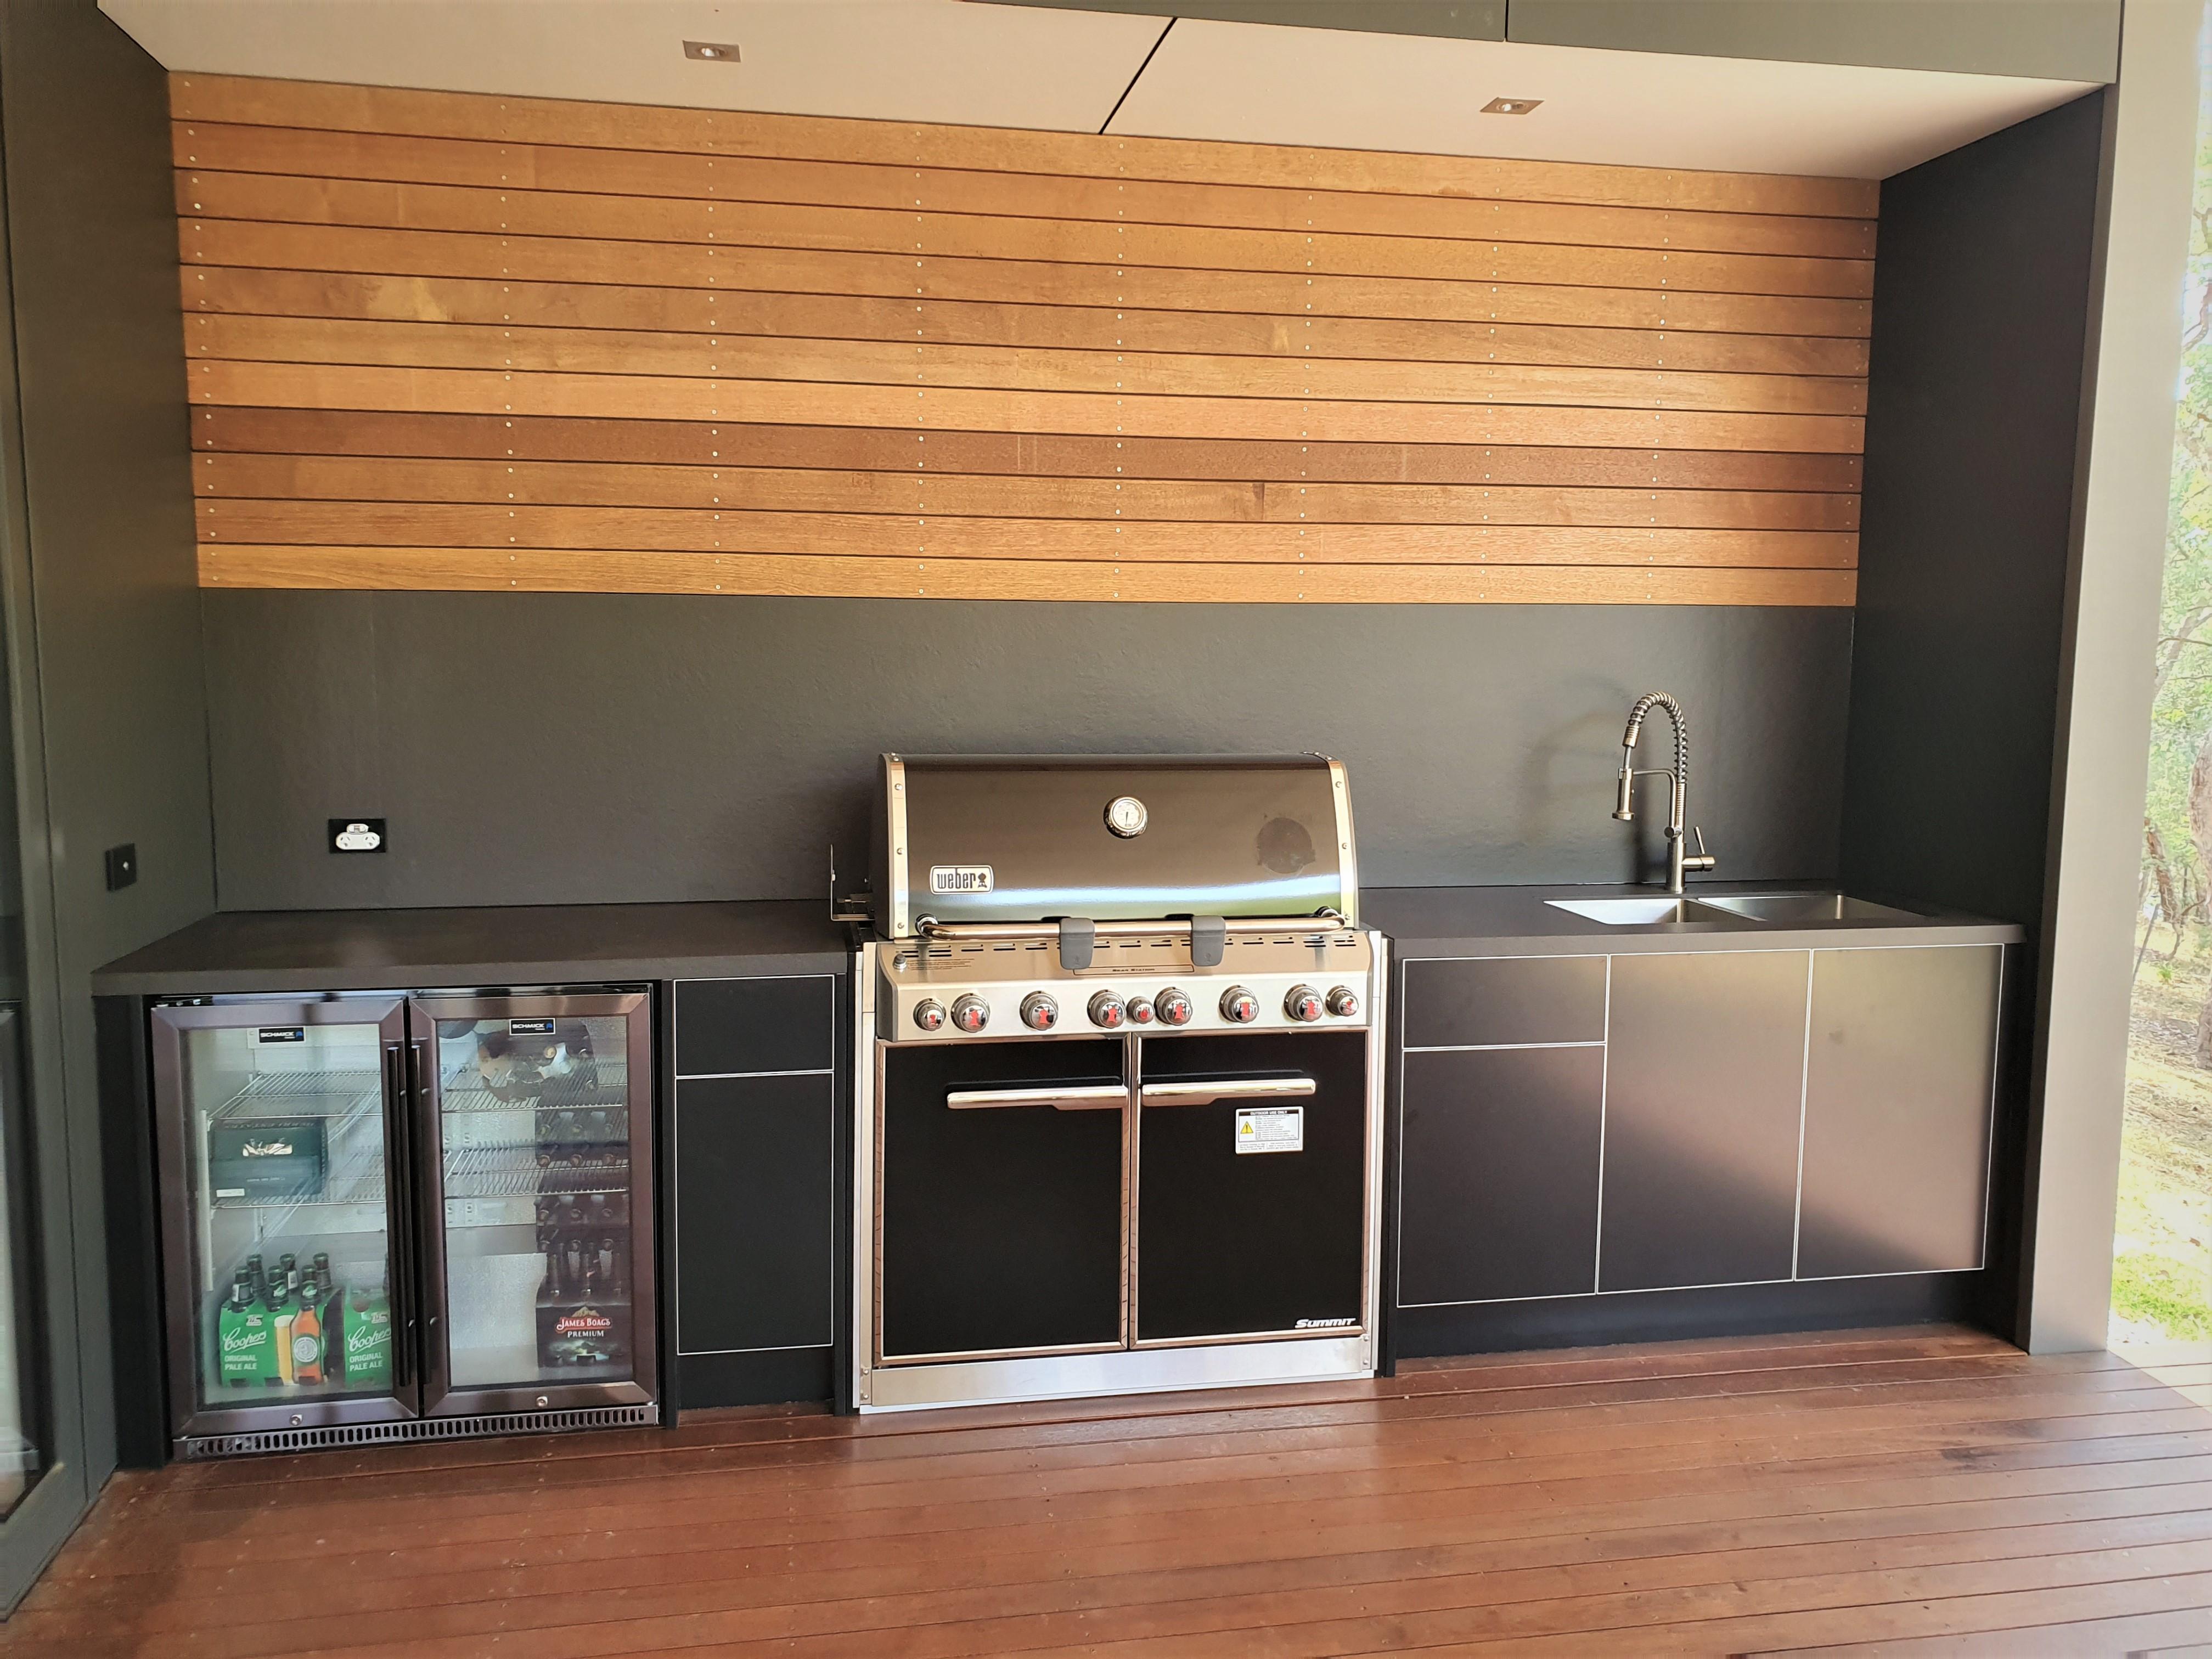 Weber Summit E660 Matte Black with Dekton Sirius benchtops and Splashbacks Timber Feature Alfresco Kitchen